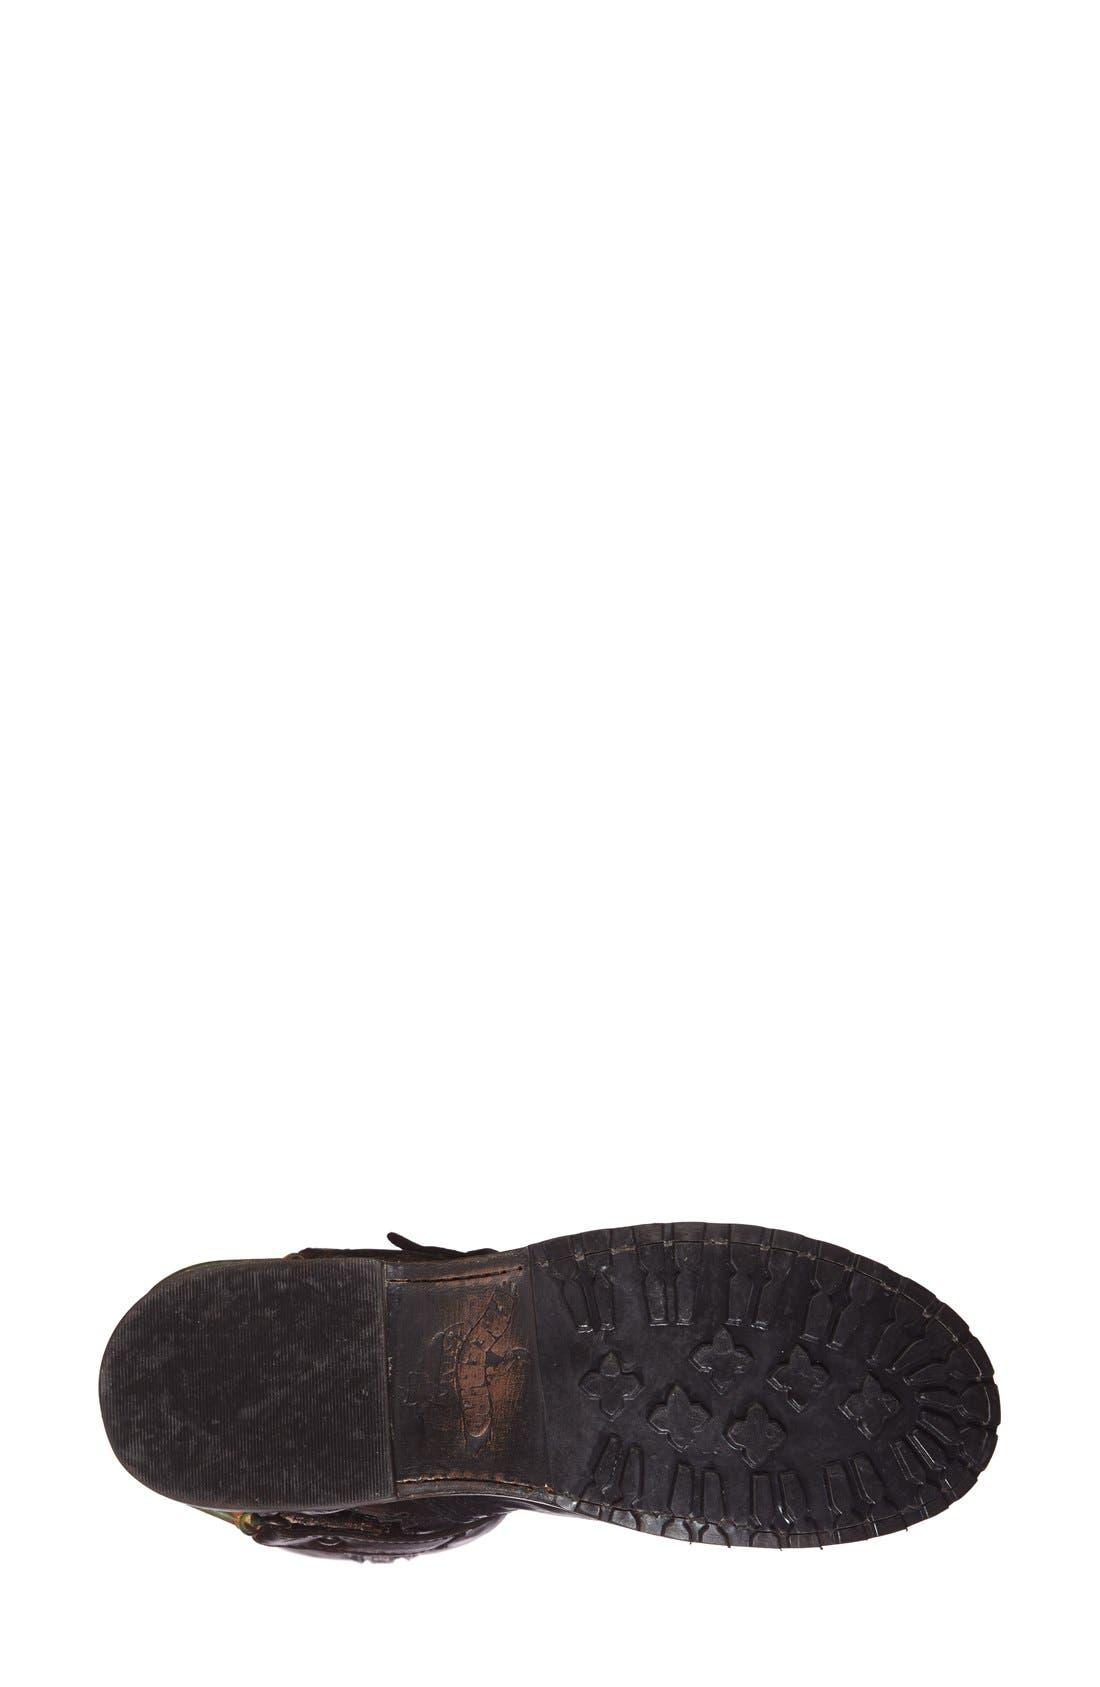 Alternate Image 4  - Freebird by Steven 'Lyon' Leather Riding Boot (Women)